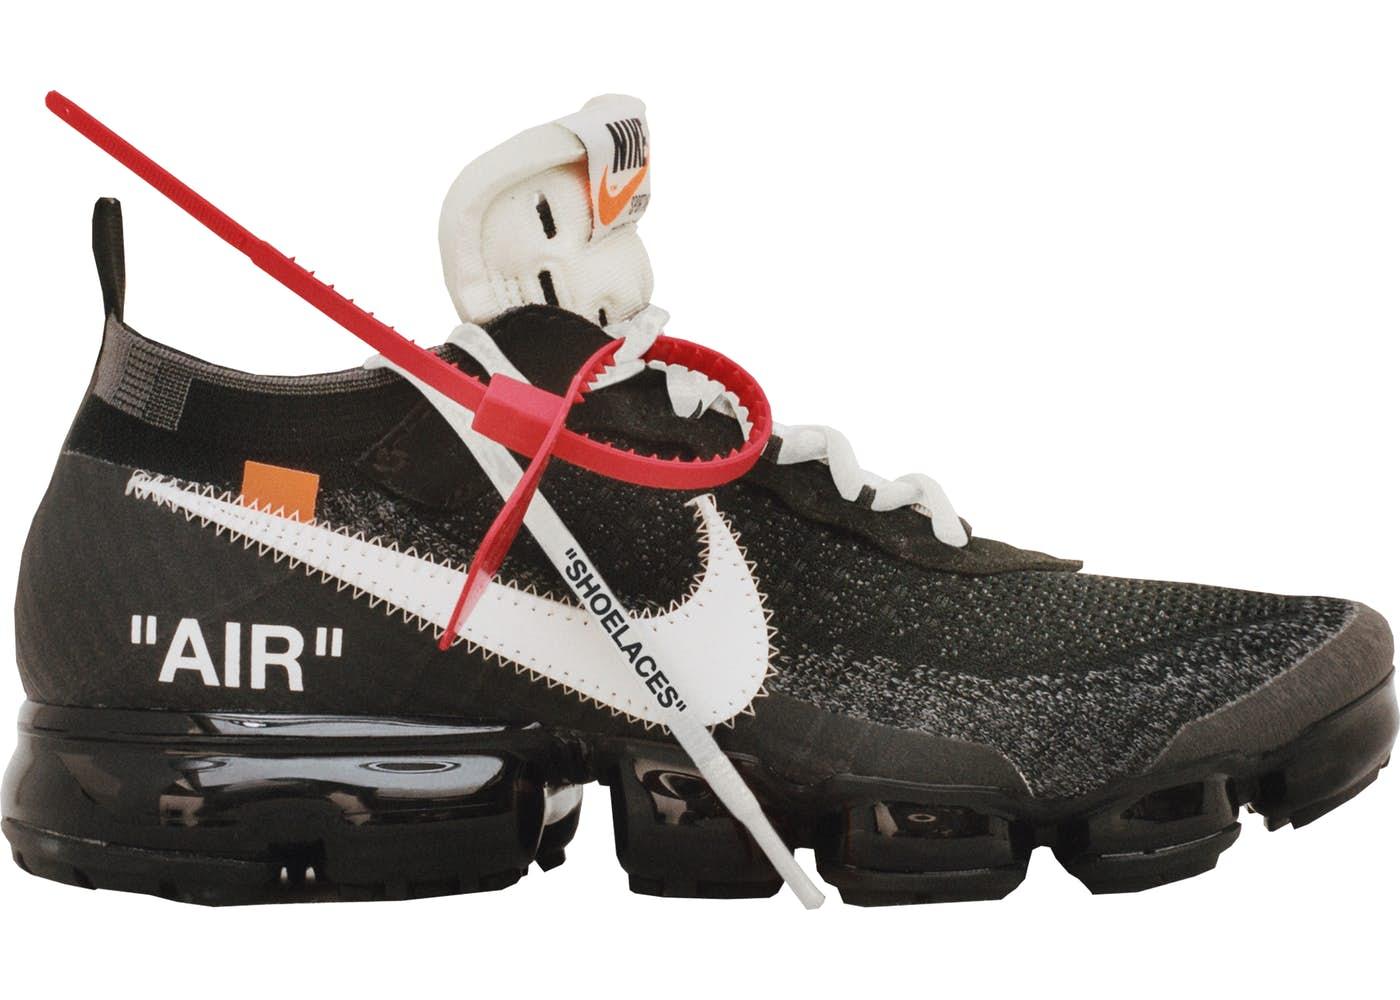 Air VaporMax Off-White(エアヴェイパーマックス オフホワイト)ブラック/ホワイト-クリア